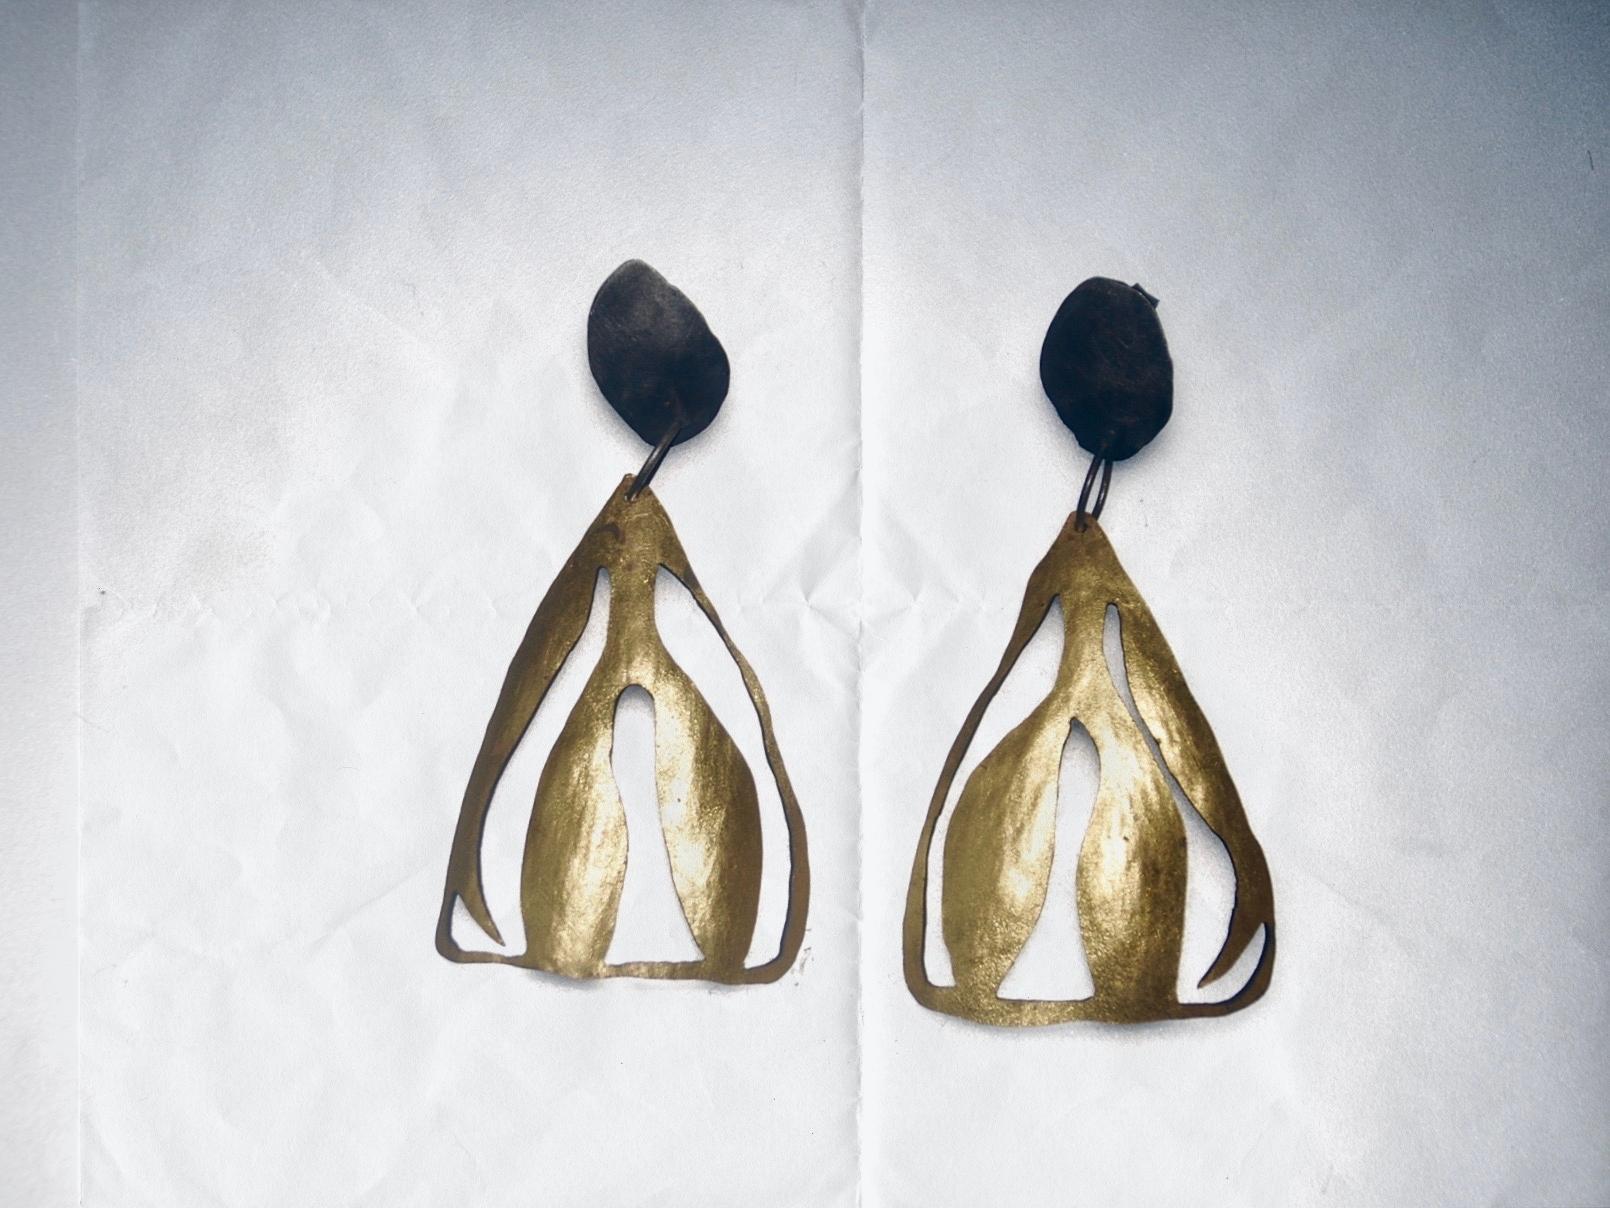 Triangle peony earrings